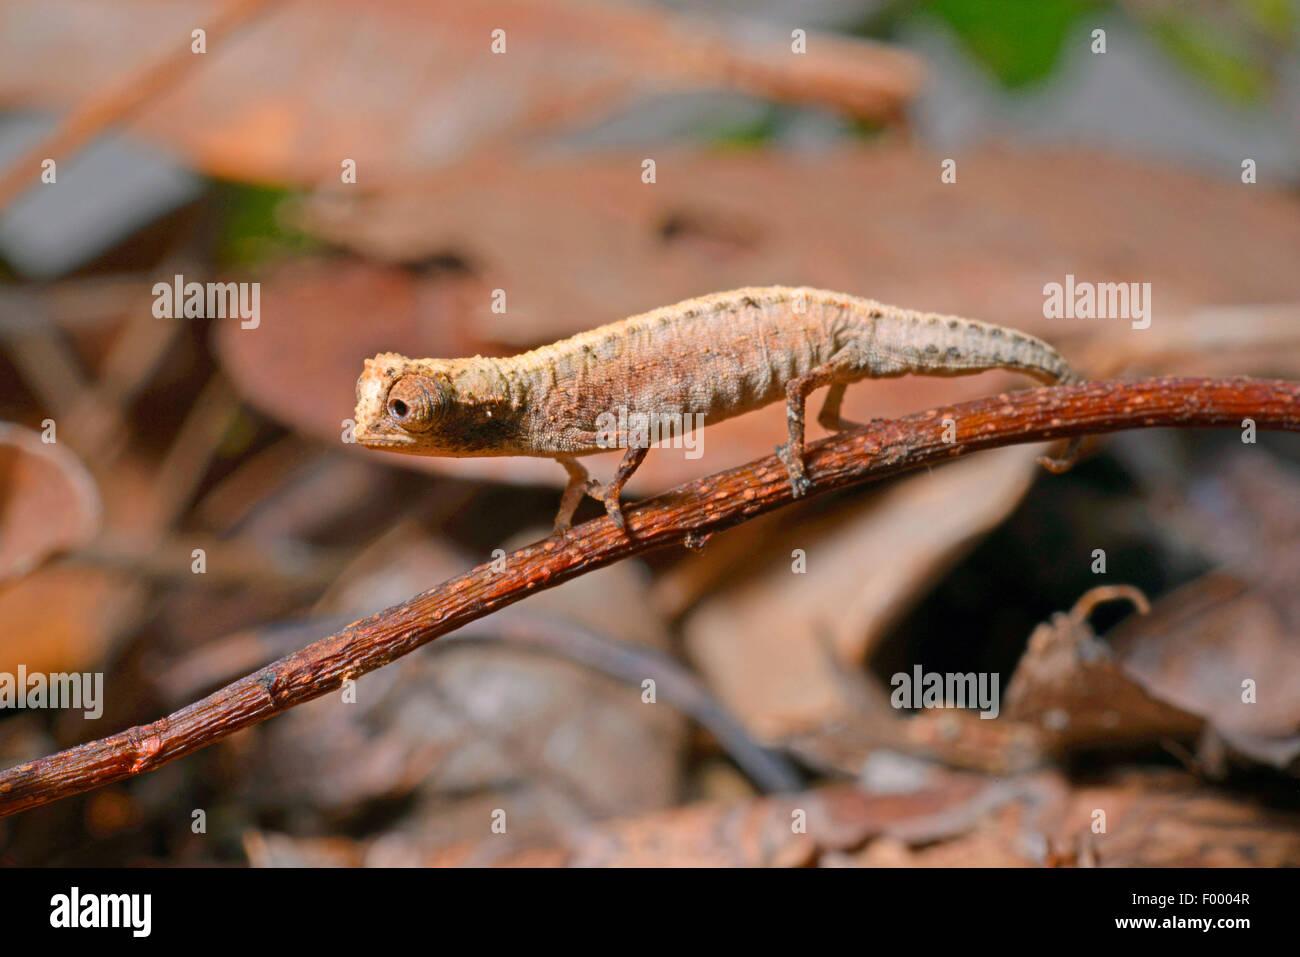 Tiny Leaf Chameleon Stock Photos Tiny Leaf Chameleon Stock Images